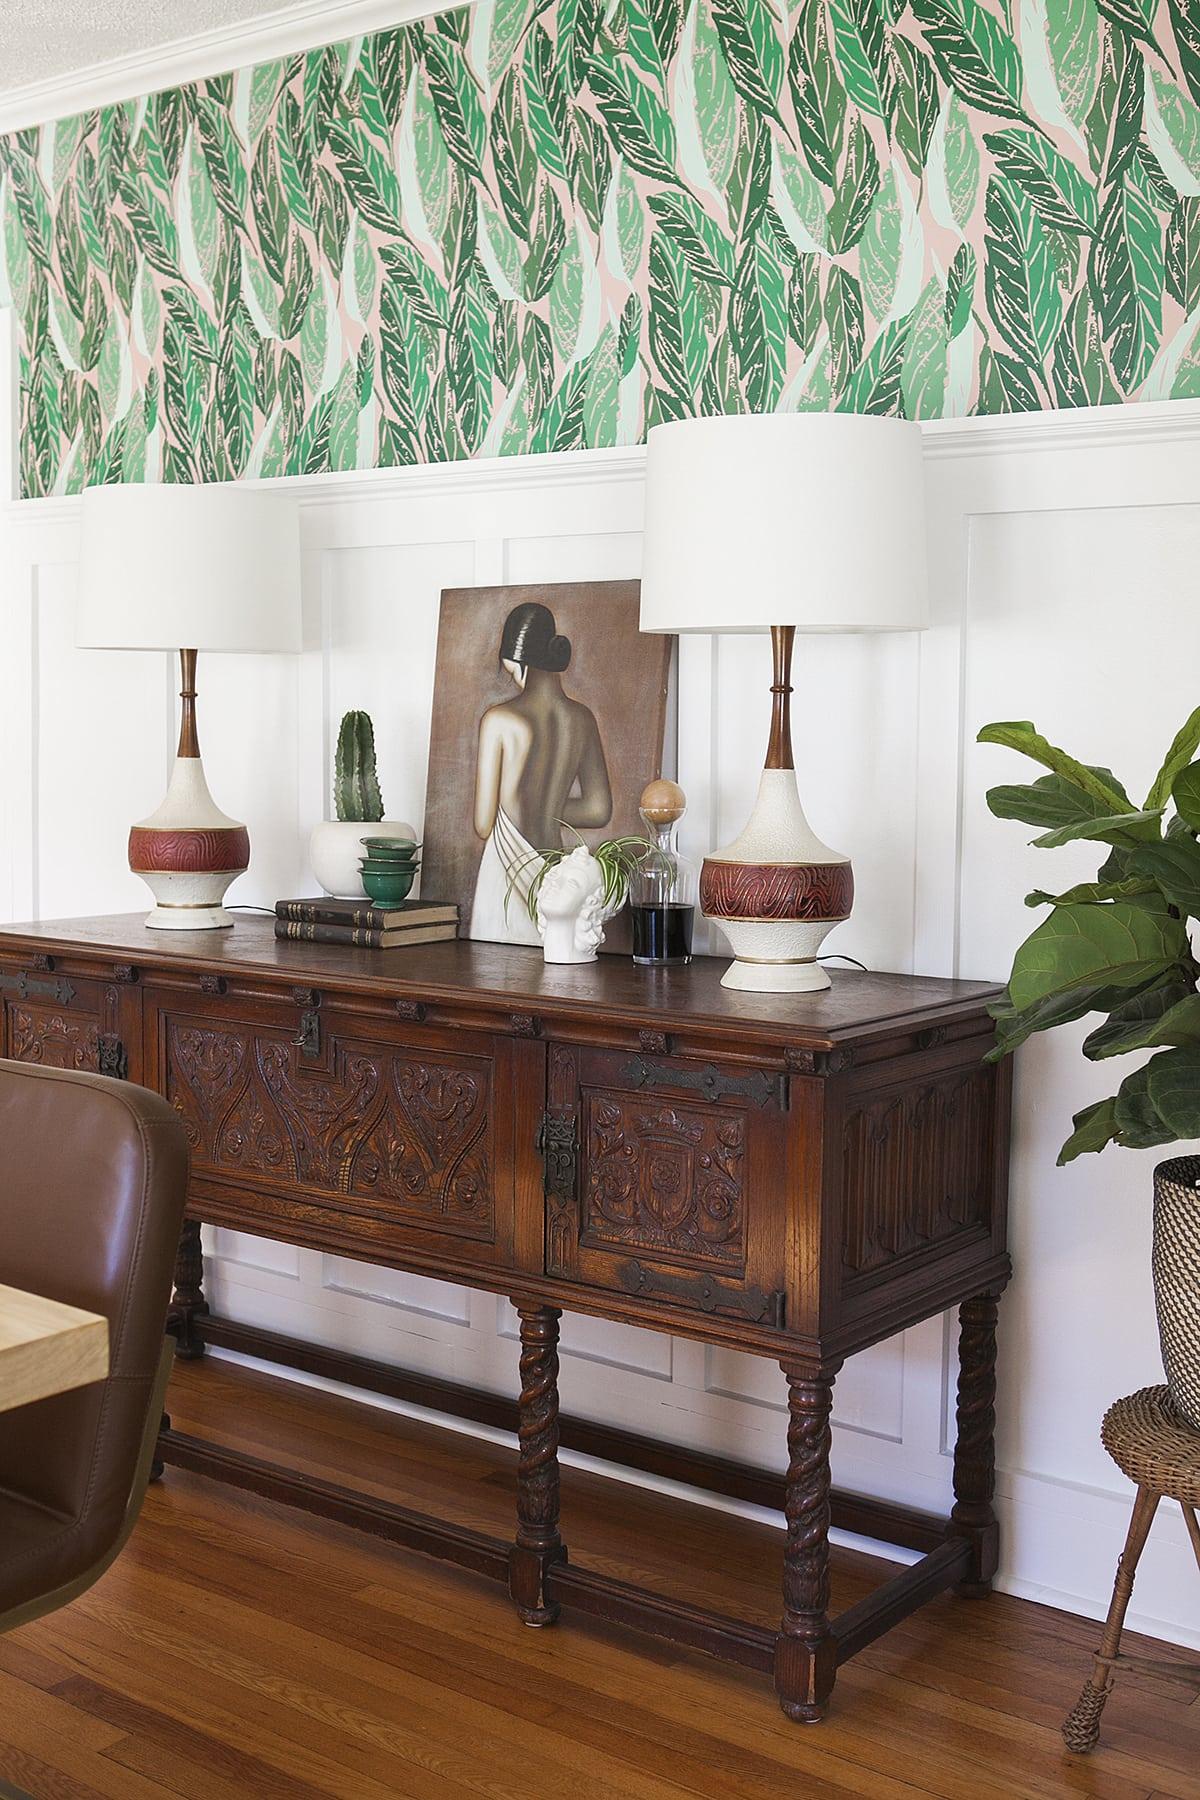 Modern Vintage Dining Room Reveal | Dining Room Design | Dining Room Decor  | Mid Century